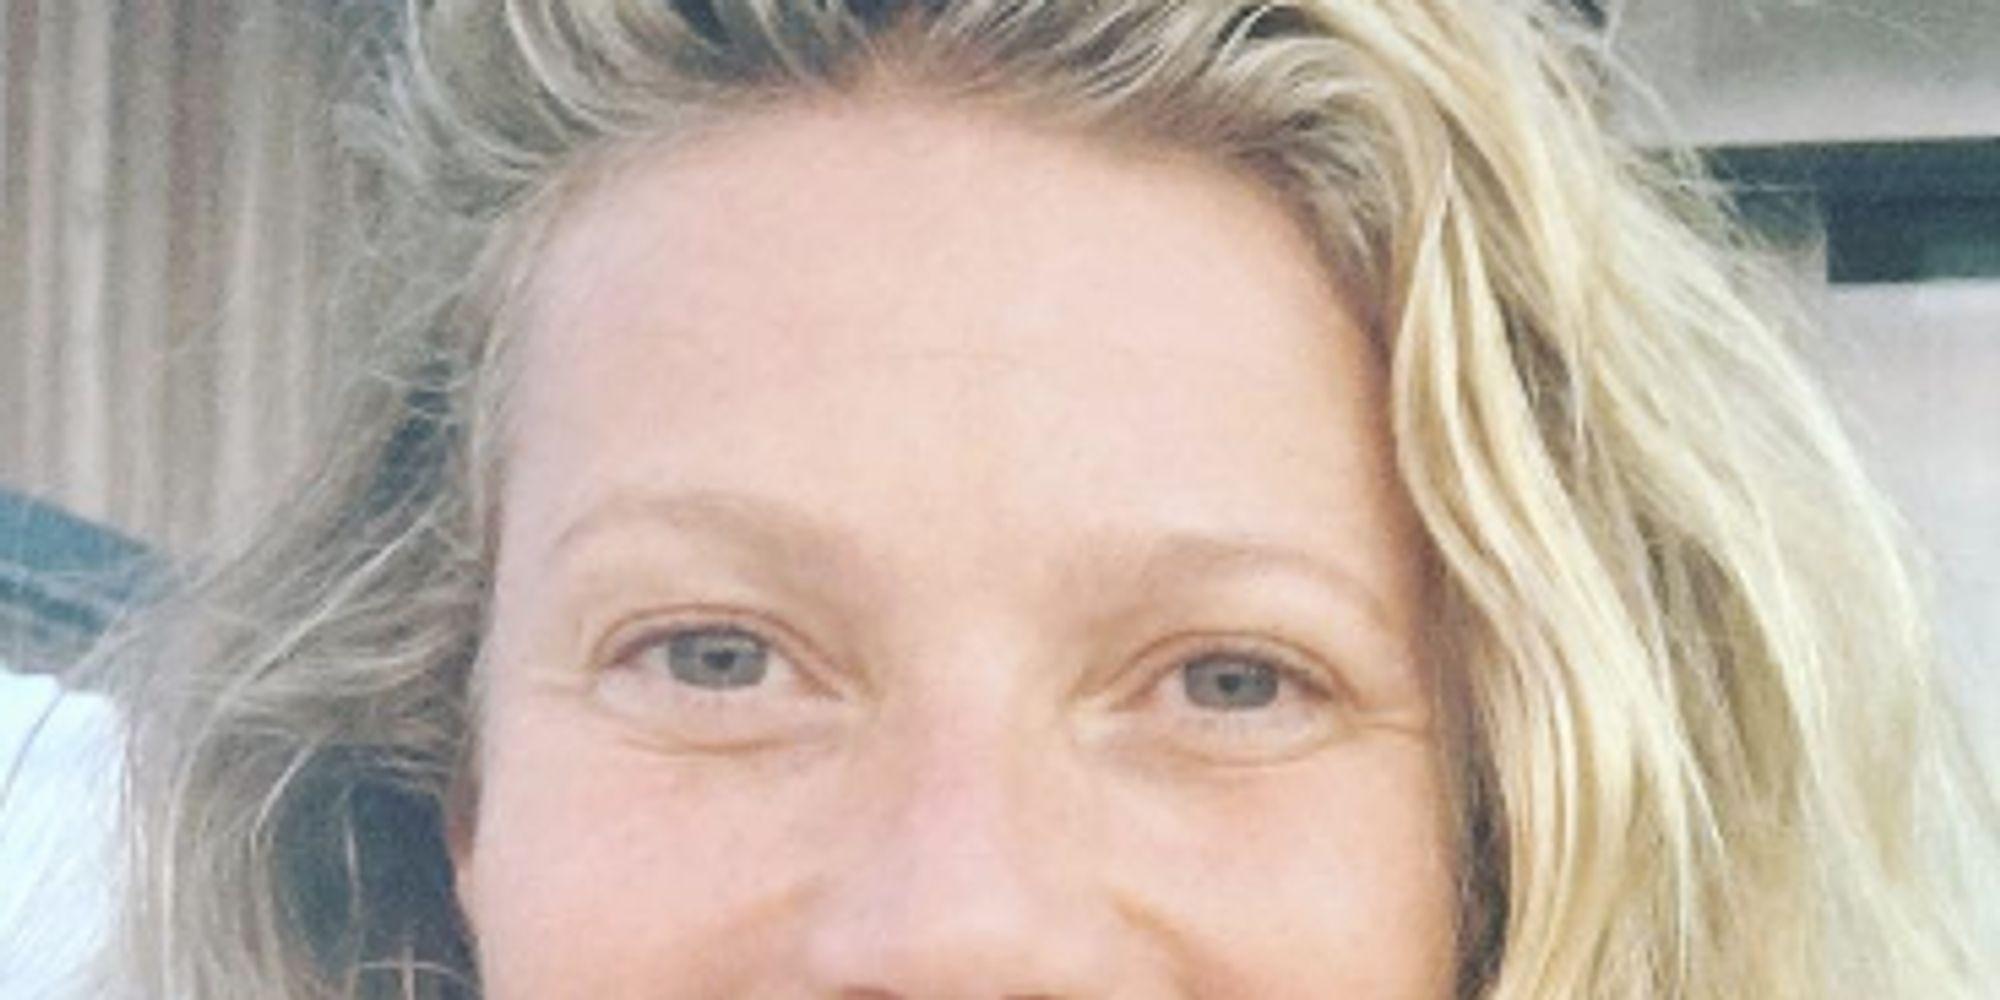 Gwyneth Paltrow's No-Makeup Selfie with Look-Alike ...